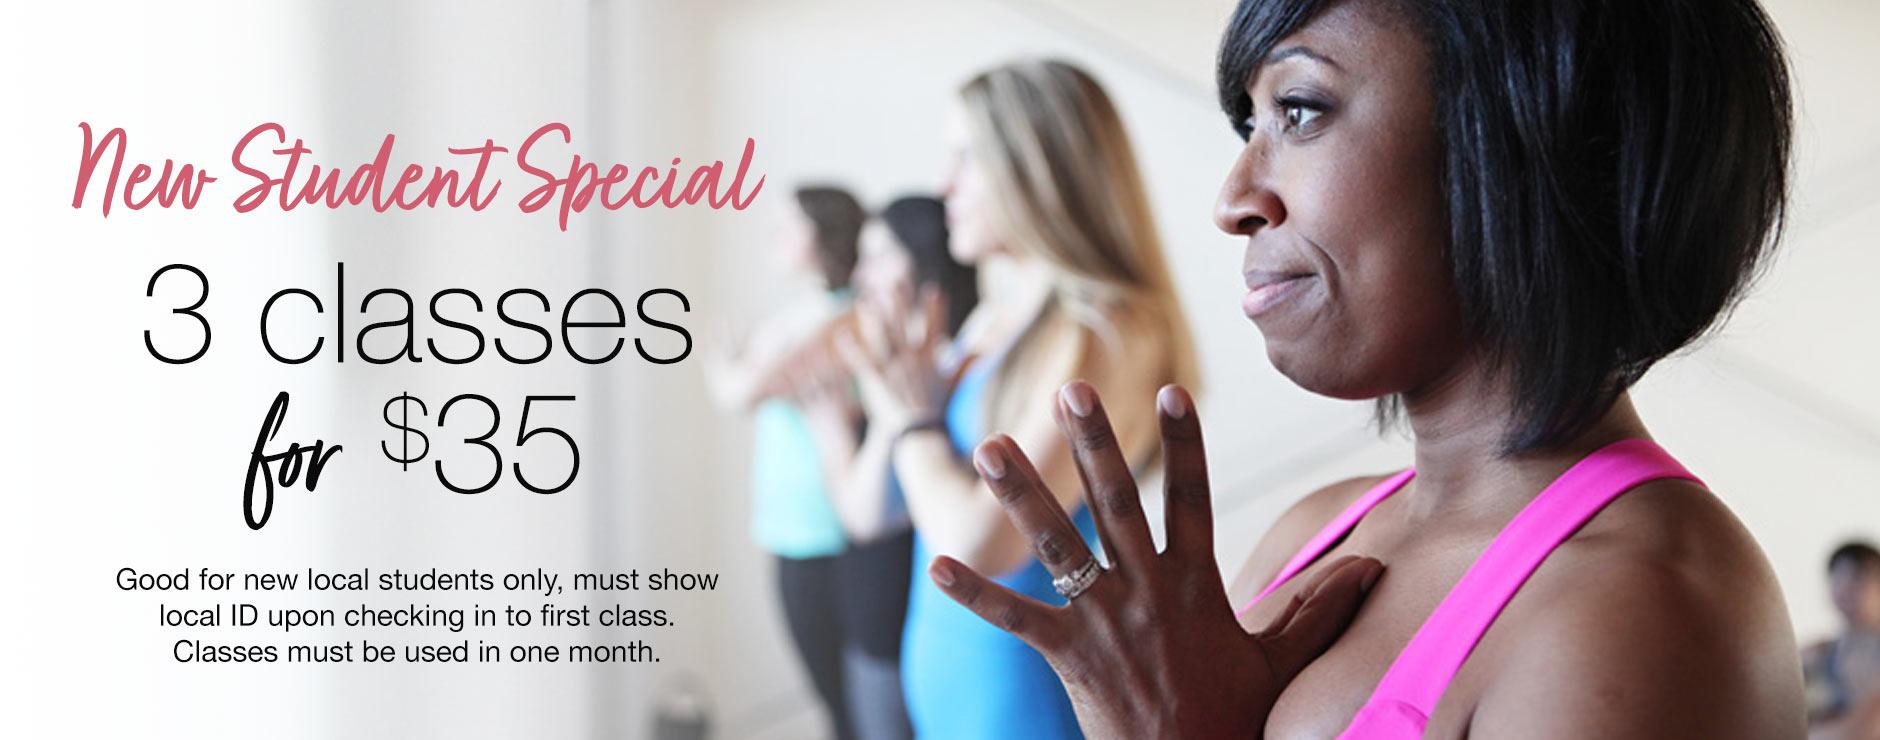 new student special form yoga Decatur Atlanta outdoor online yoga